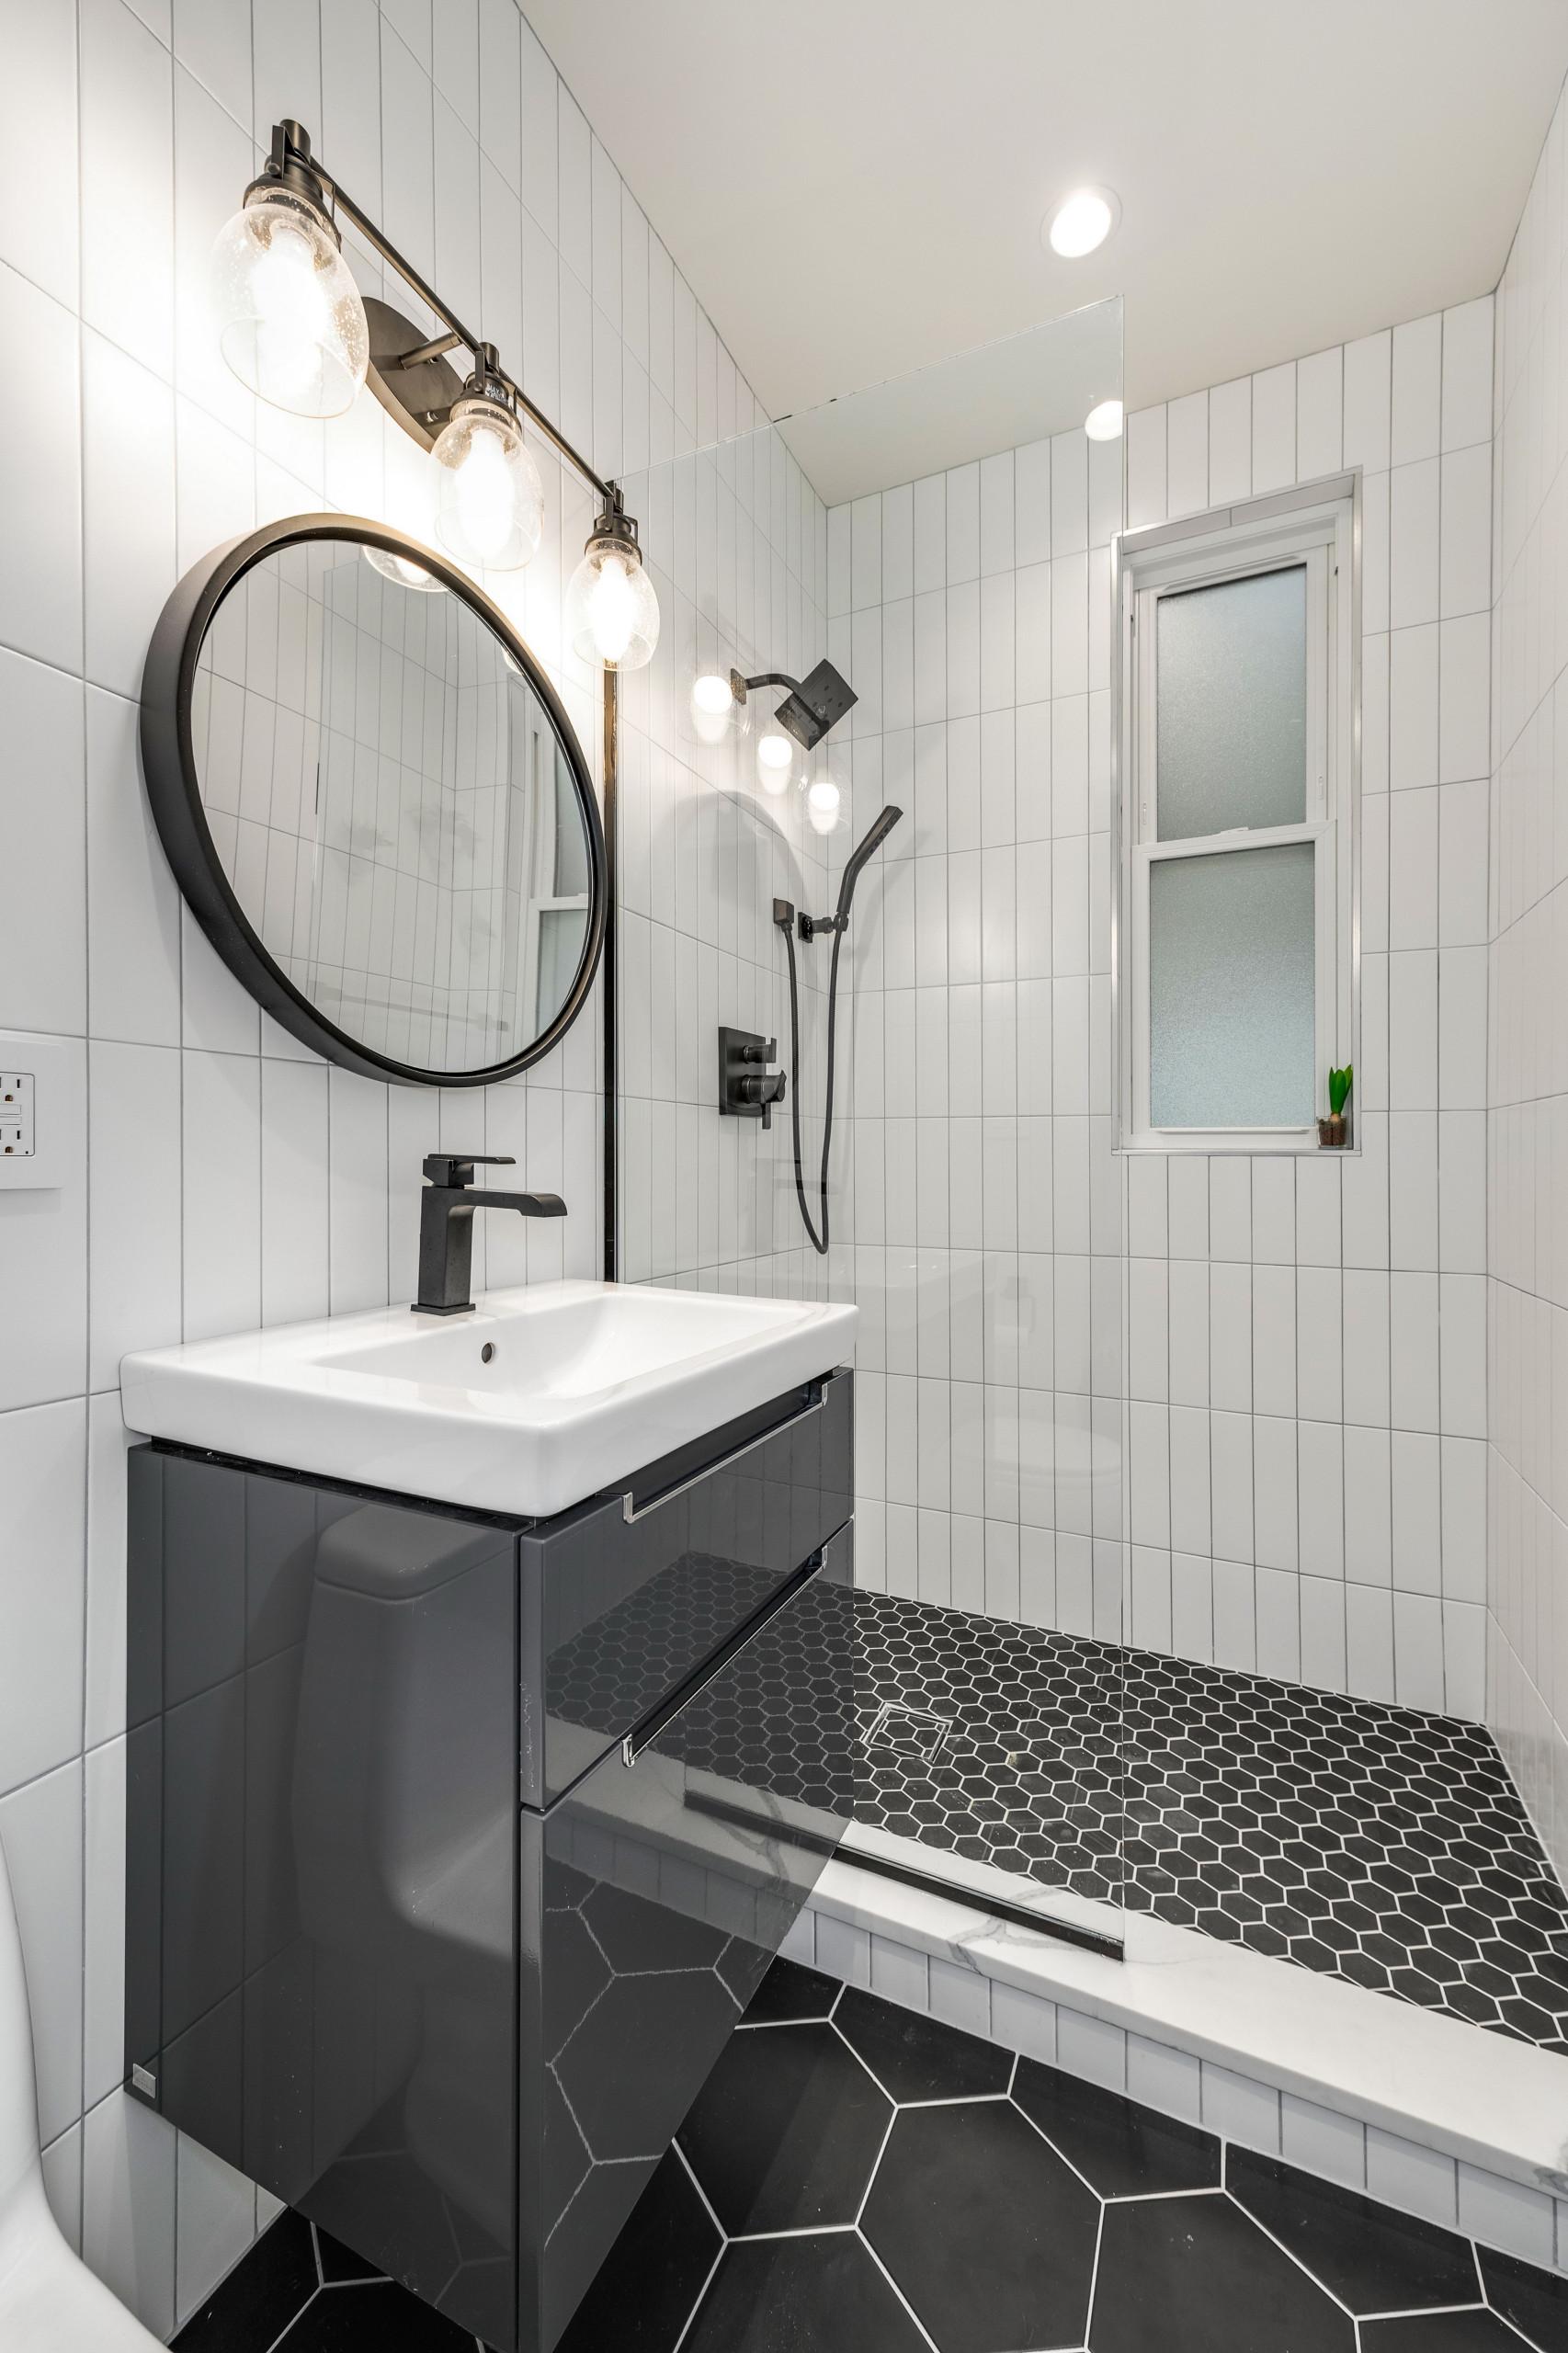 Luxury Bathroom Contrast elitelux.club